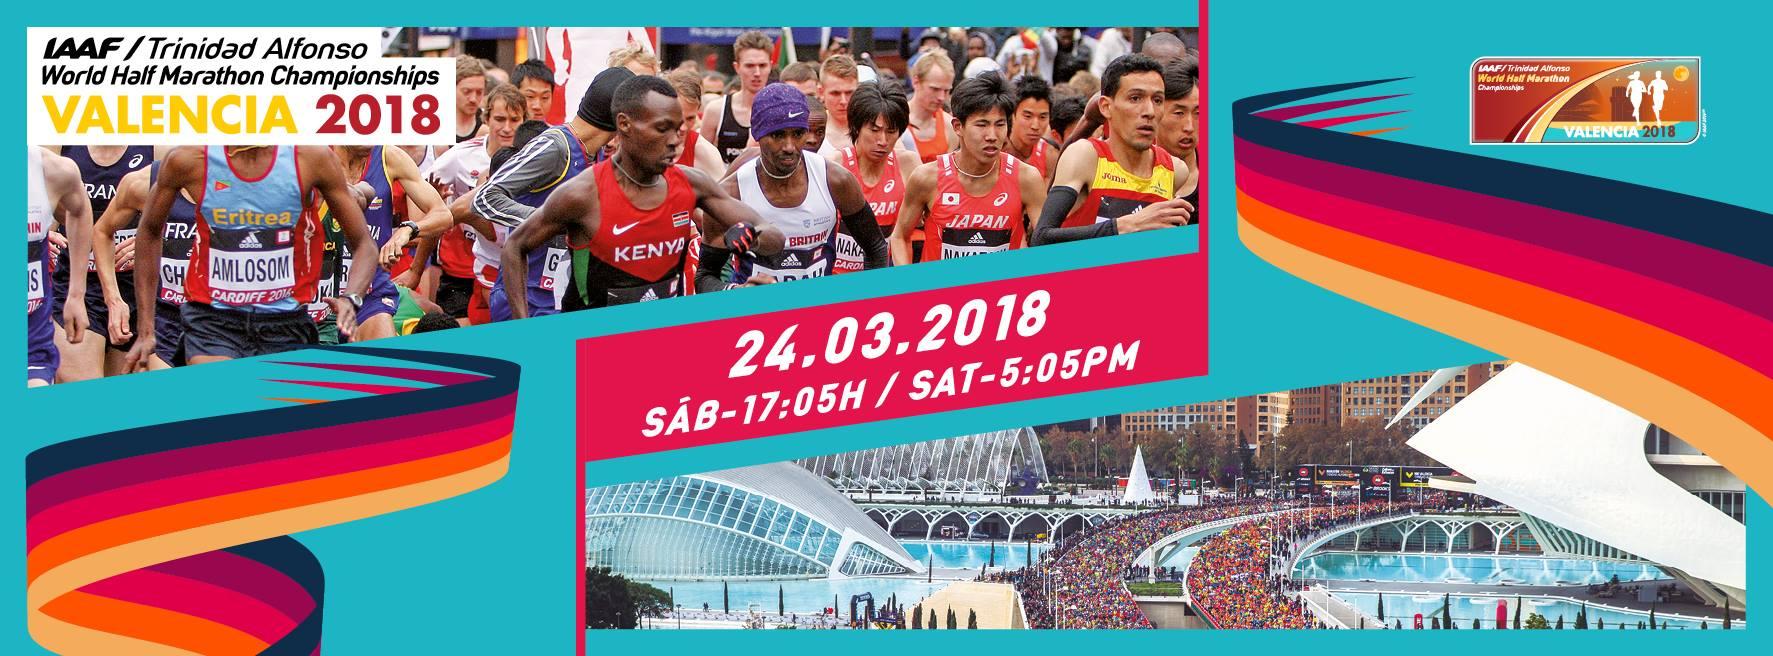 Campeonato Mundial da Meia Maratona - Valência 2018